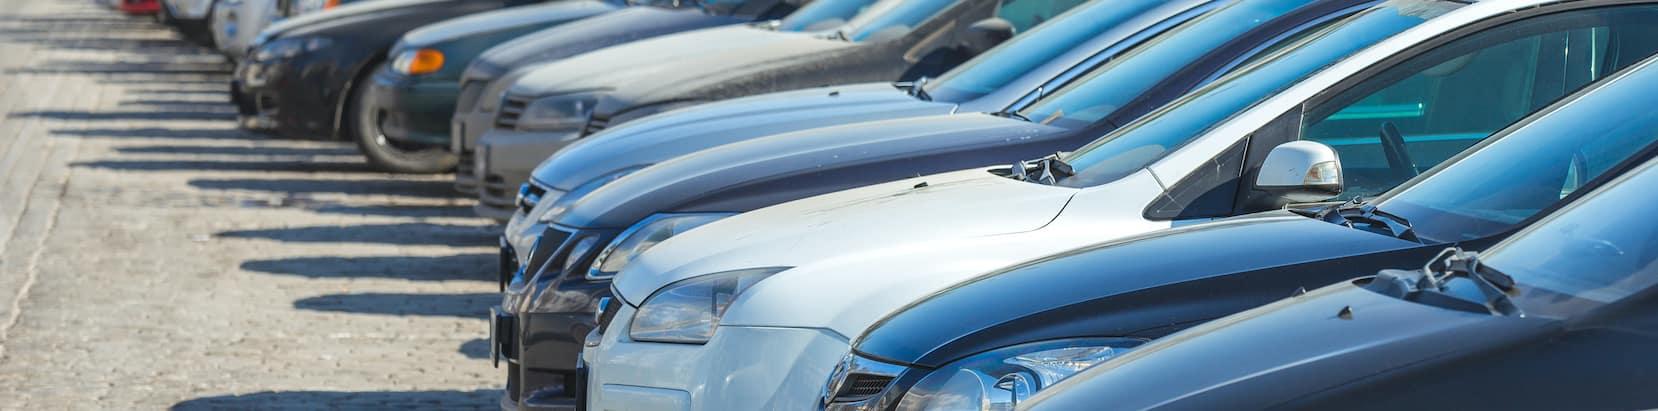 Used Car Dealer Buena Park CA